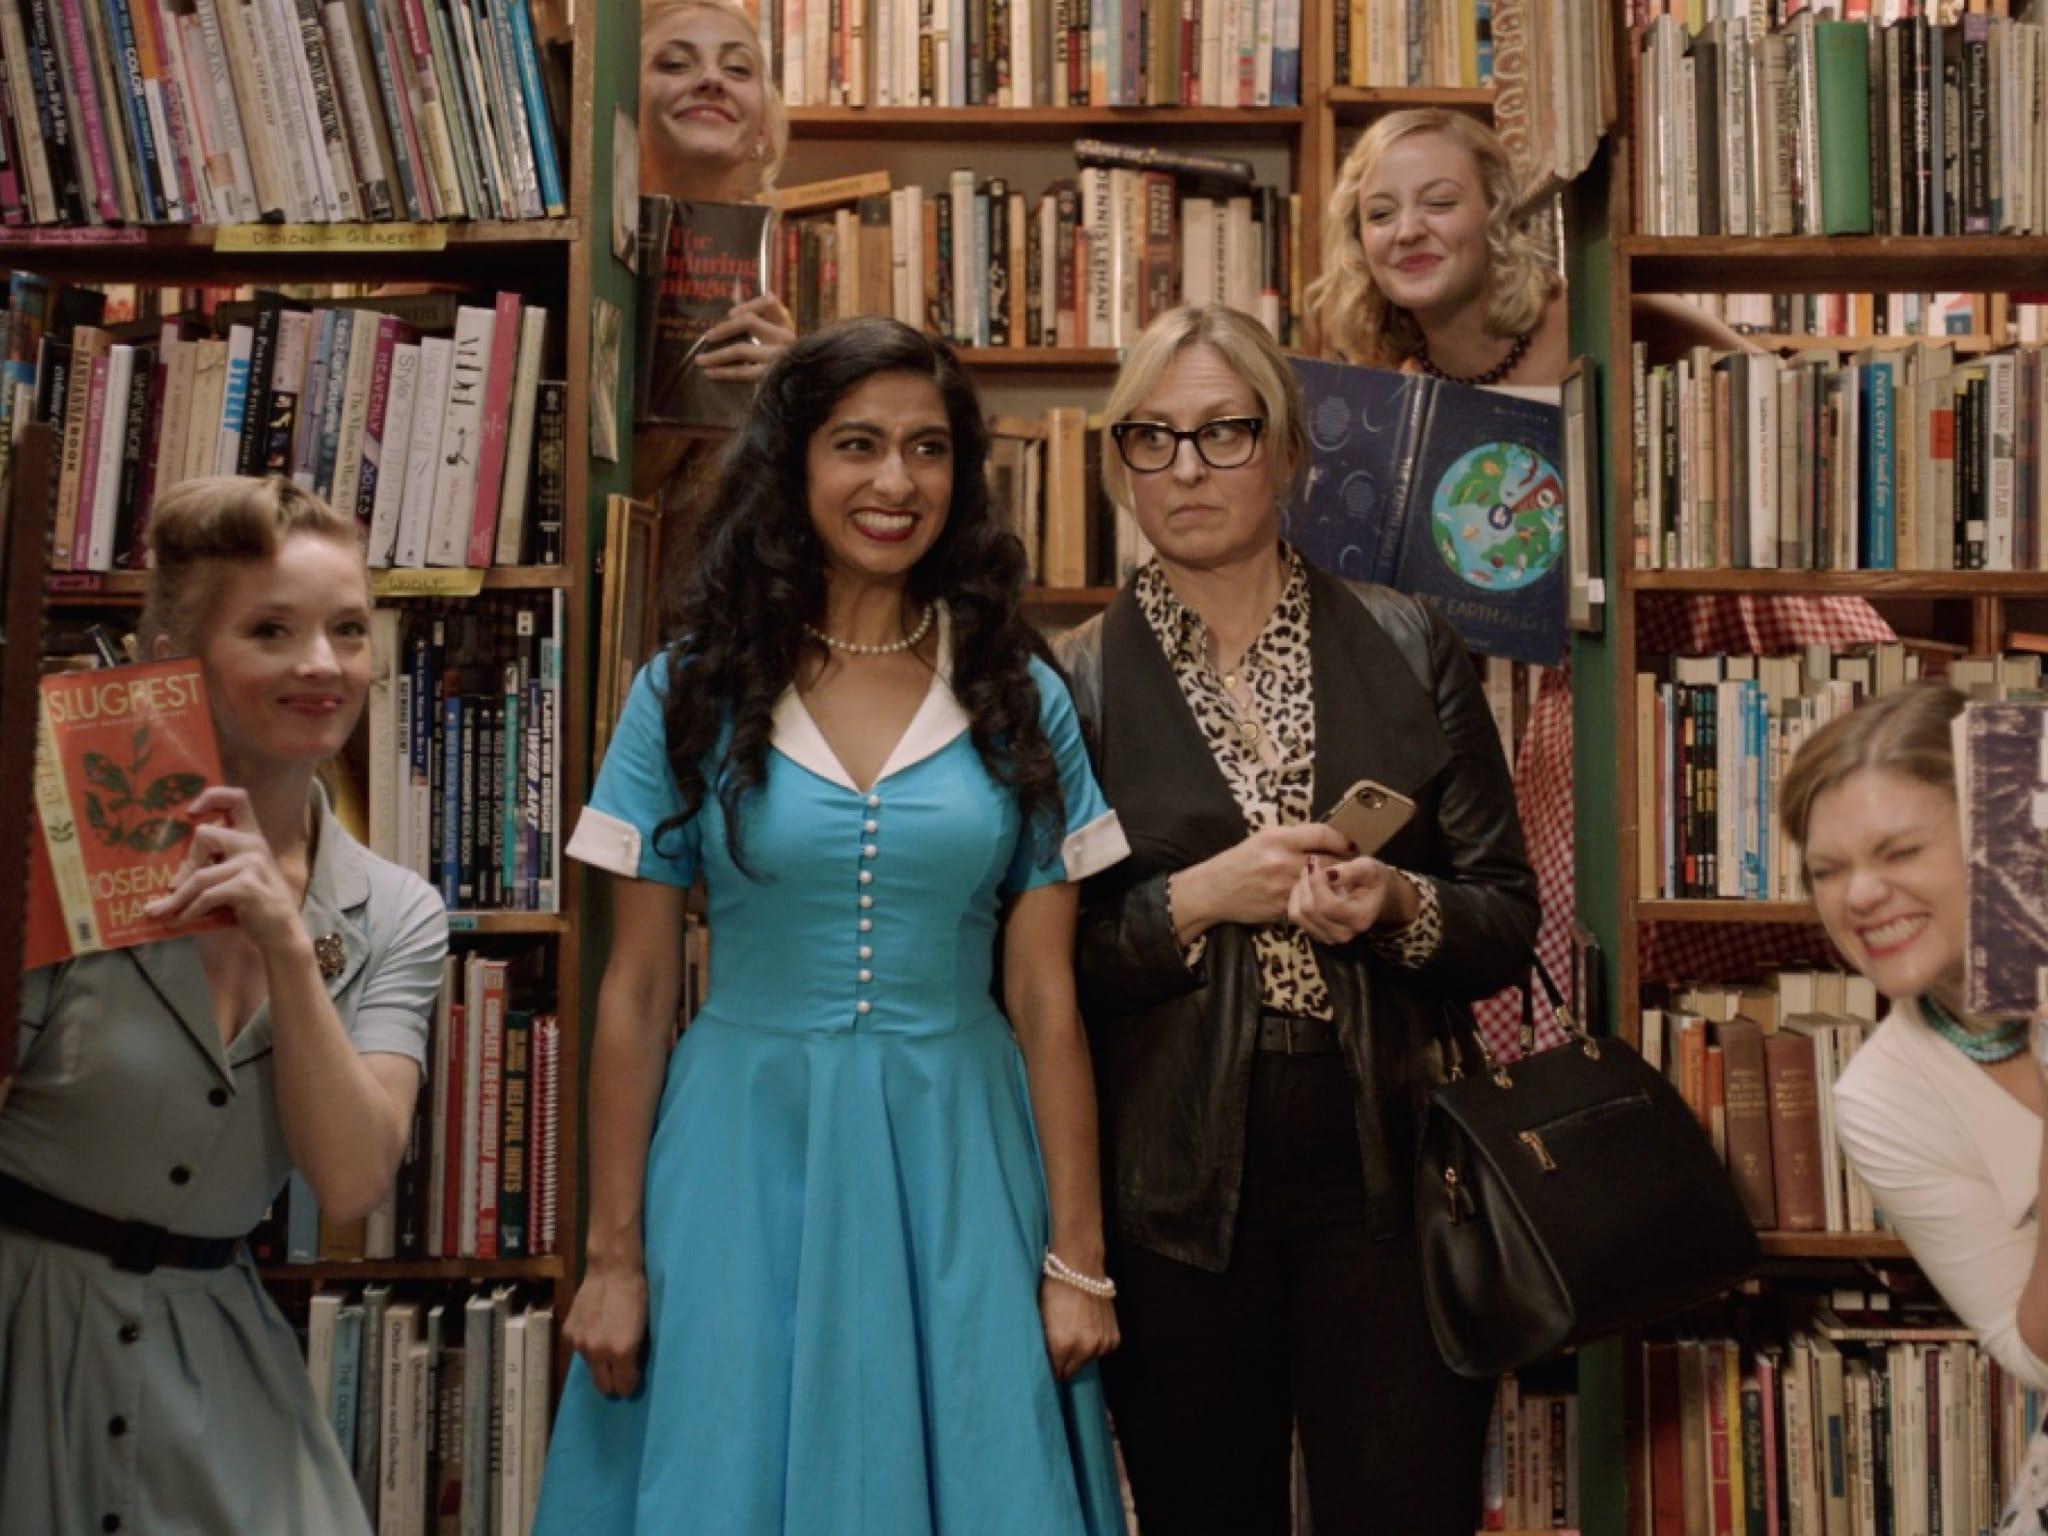 A group of women standing in front of bookshelves full of books.